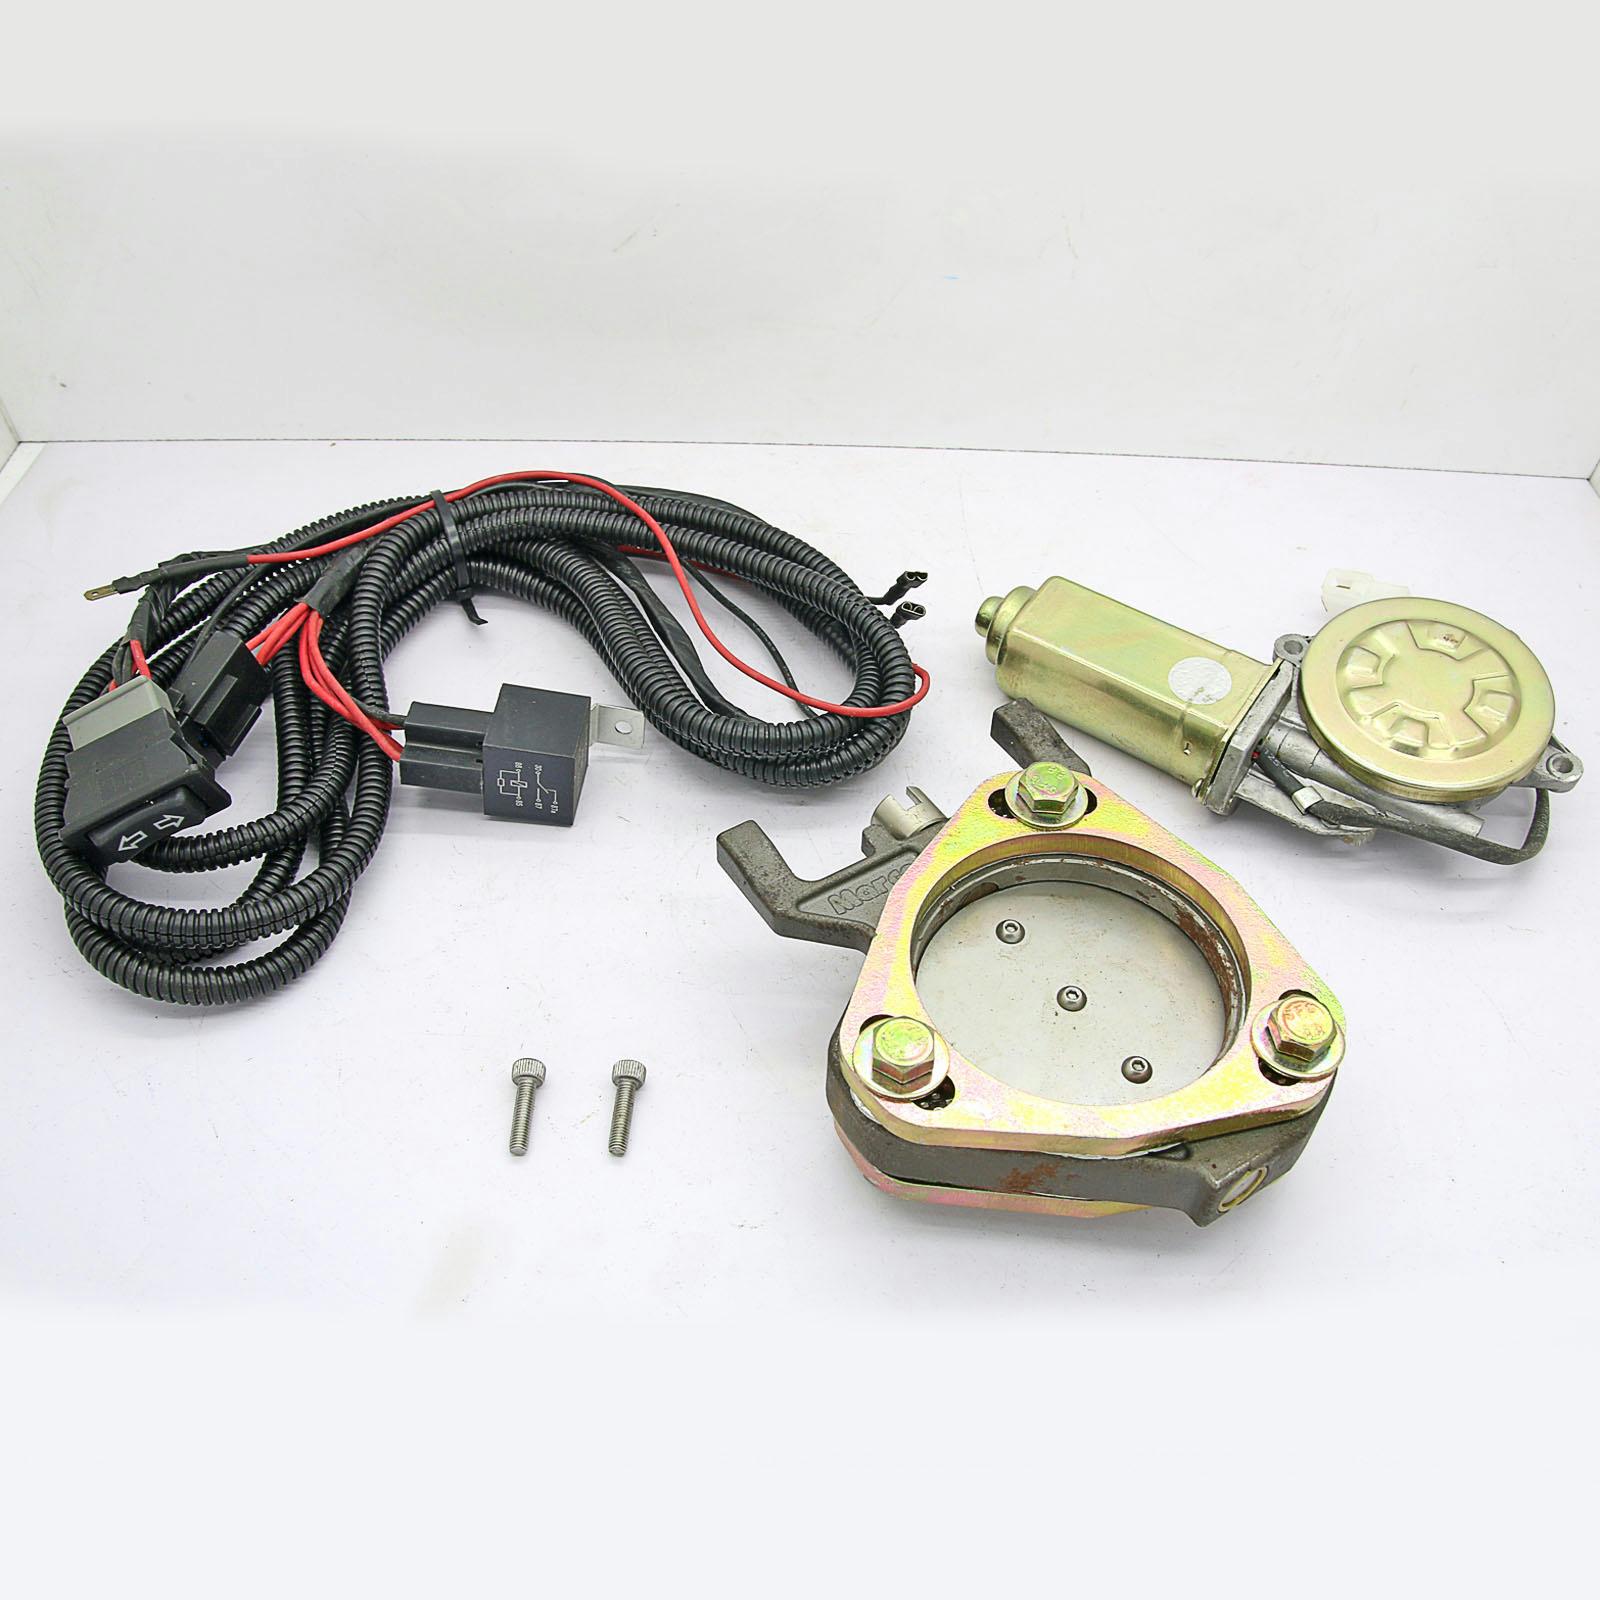 3 Universal Fit Electronic Exhaust Remote Control Valve Motor Cutout Kit Vu 030 Ebay